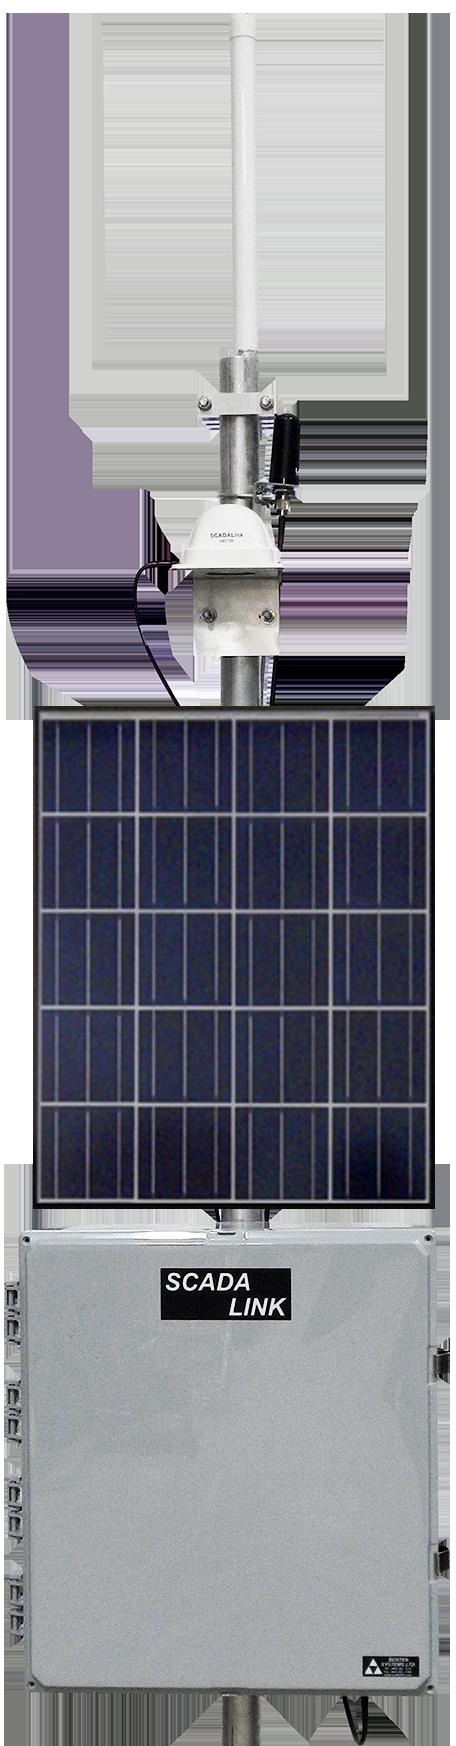 sat120-gateway-solar-rtu2